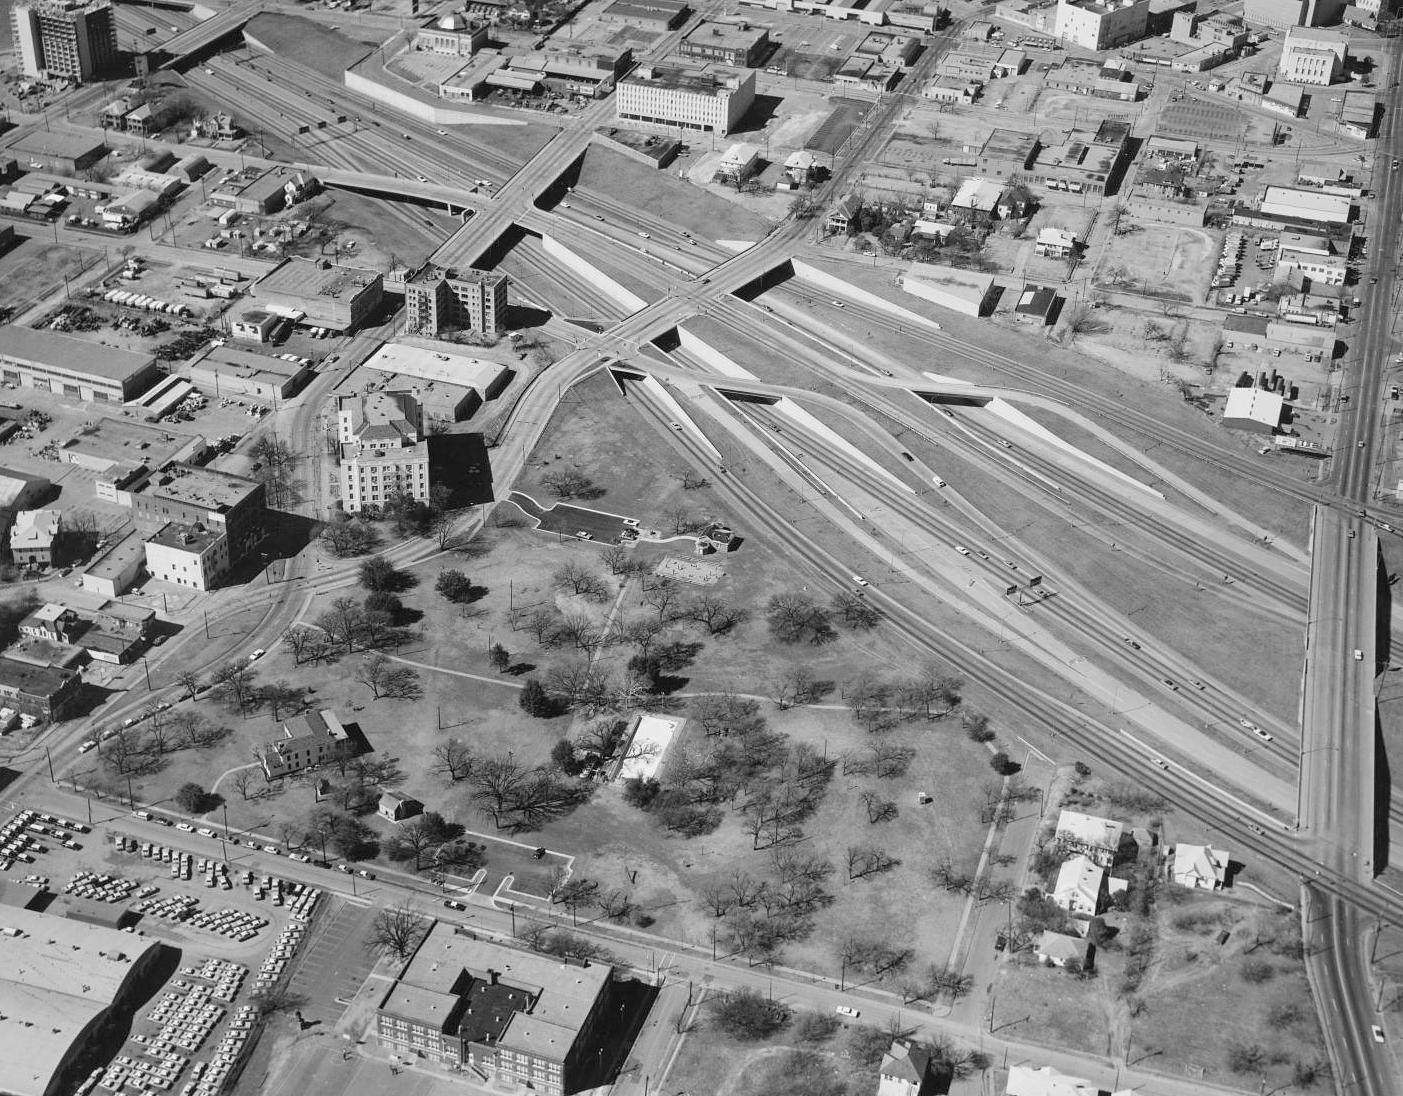 1972_city-park_aerial_squire-haskins_1972_dallas-municipal-archives_portal